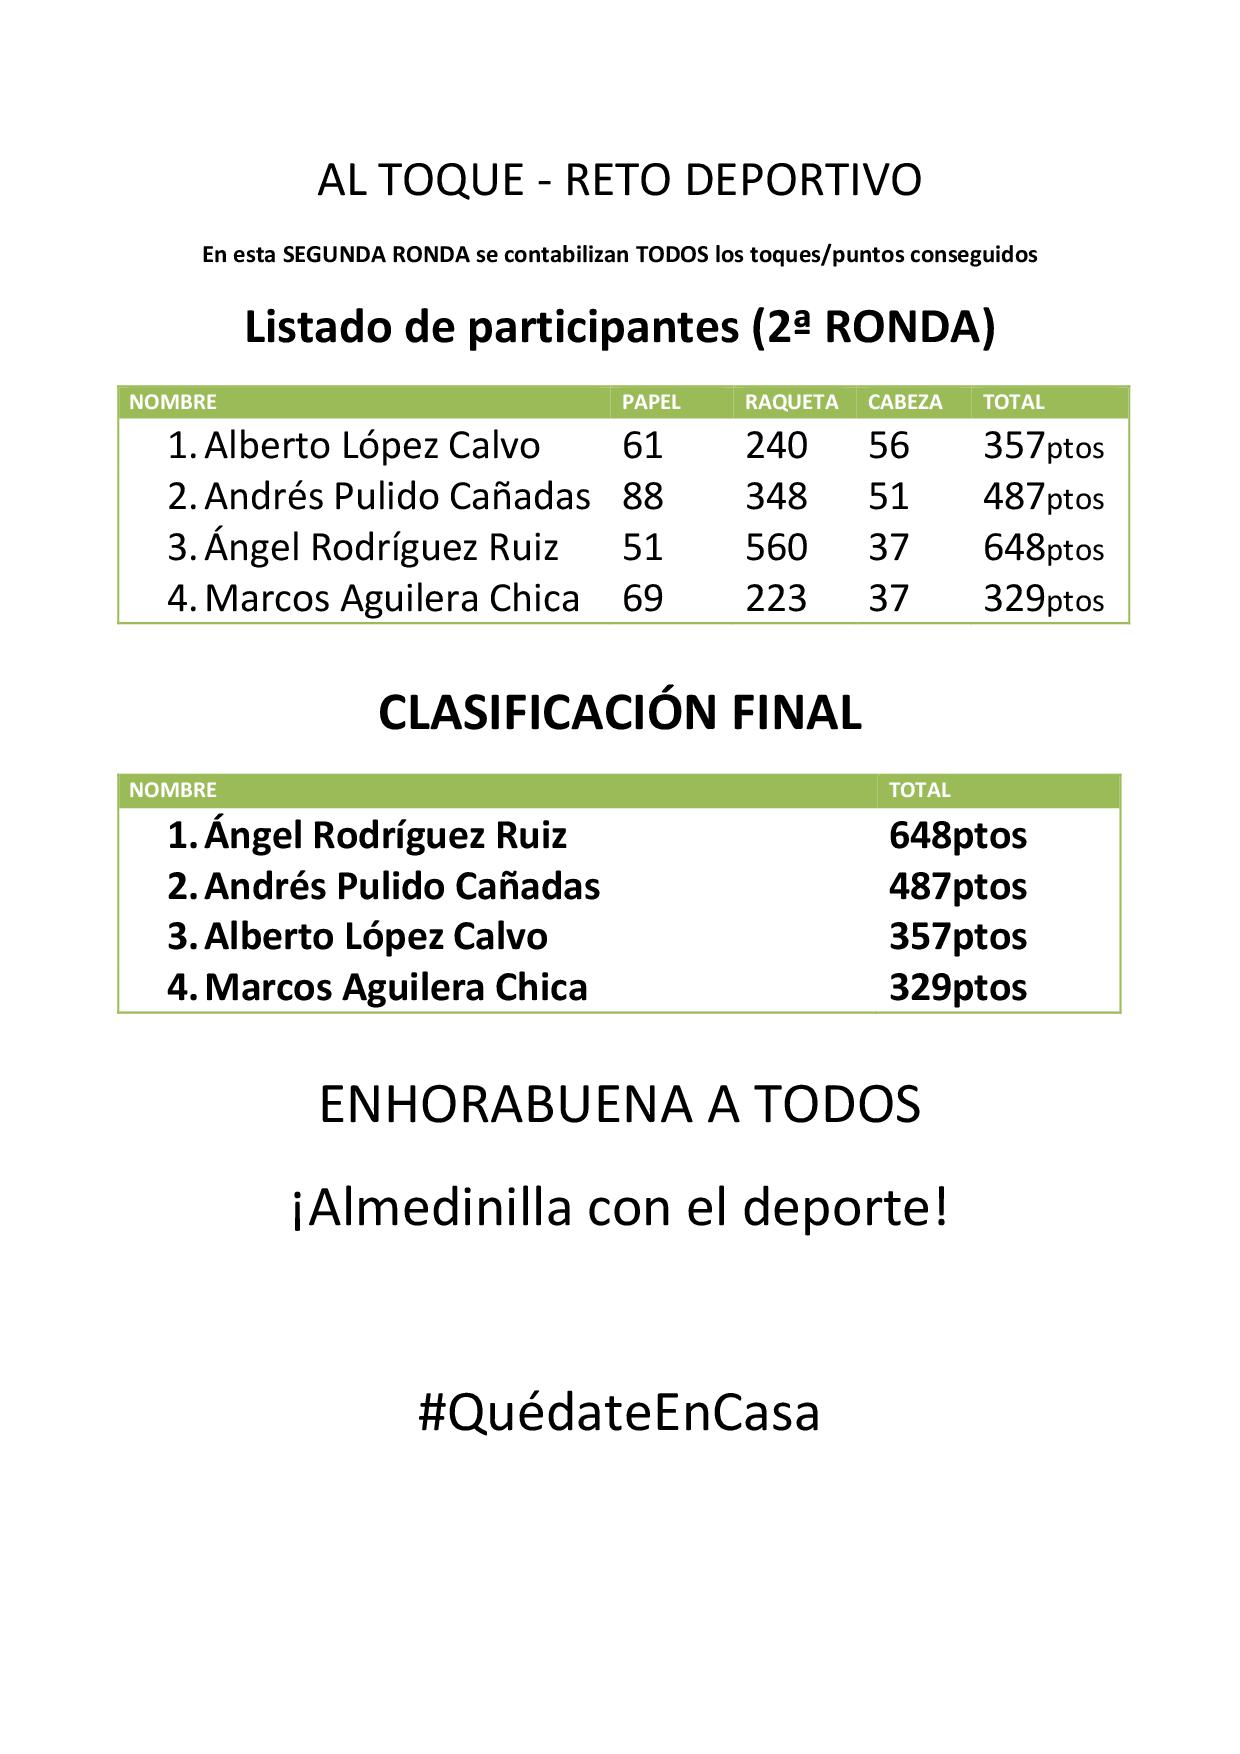 Ganadores Reto Deportivo AL TOQUE 1